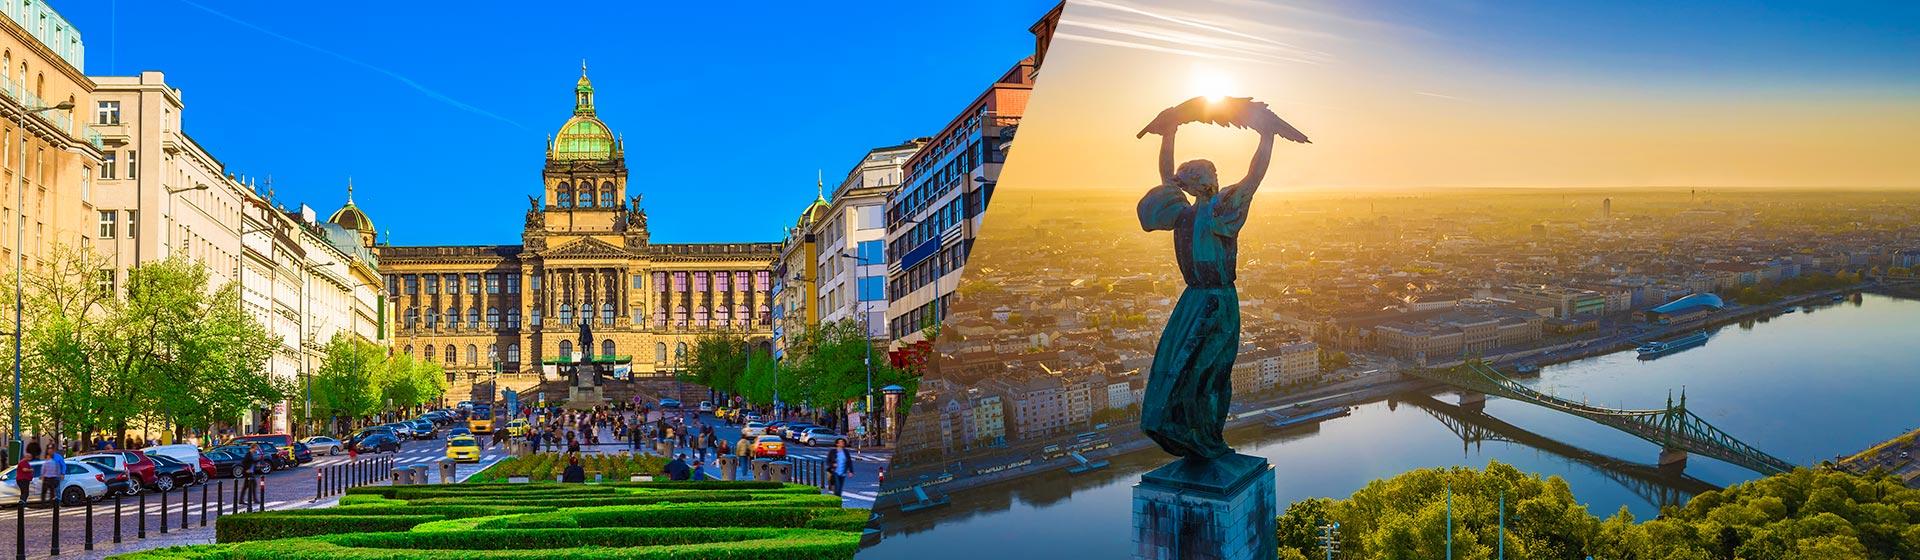 Praga -Budapest - 5 días